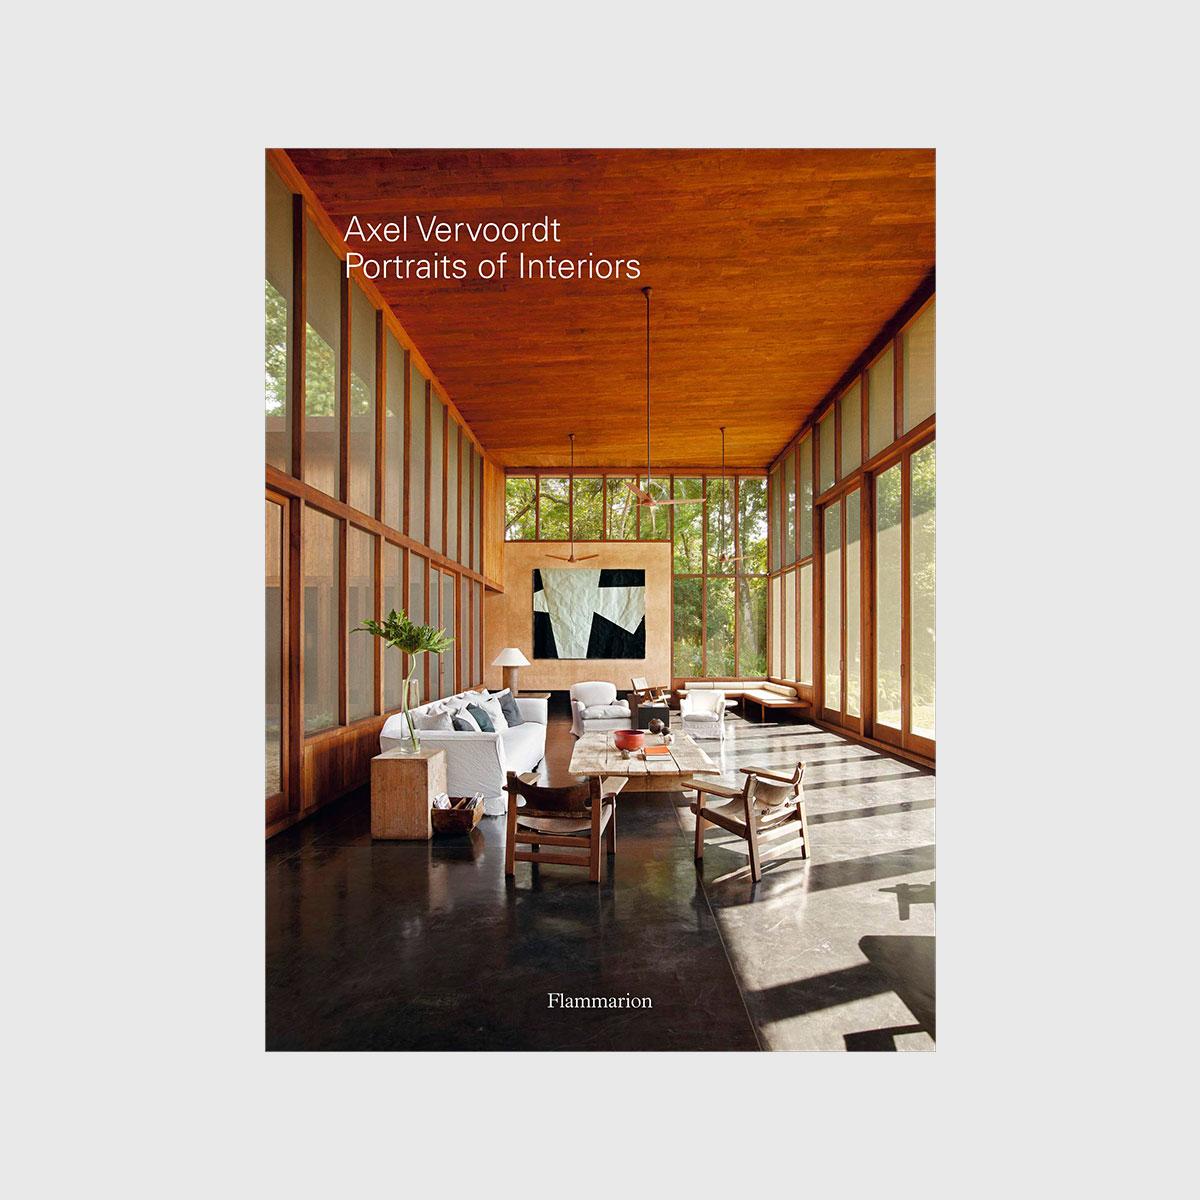 Axel Vervoordt – Portraits of Interiors